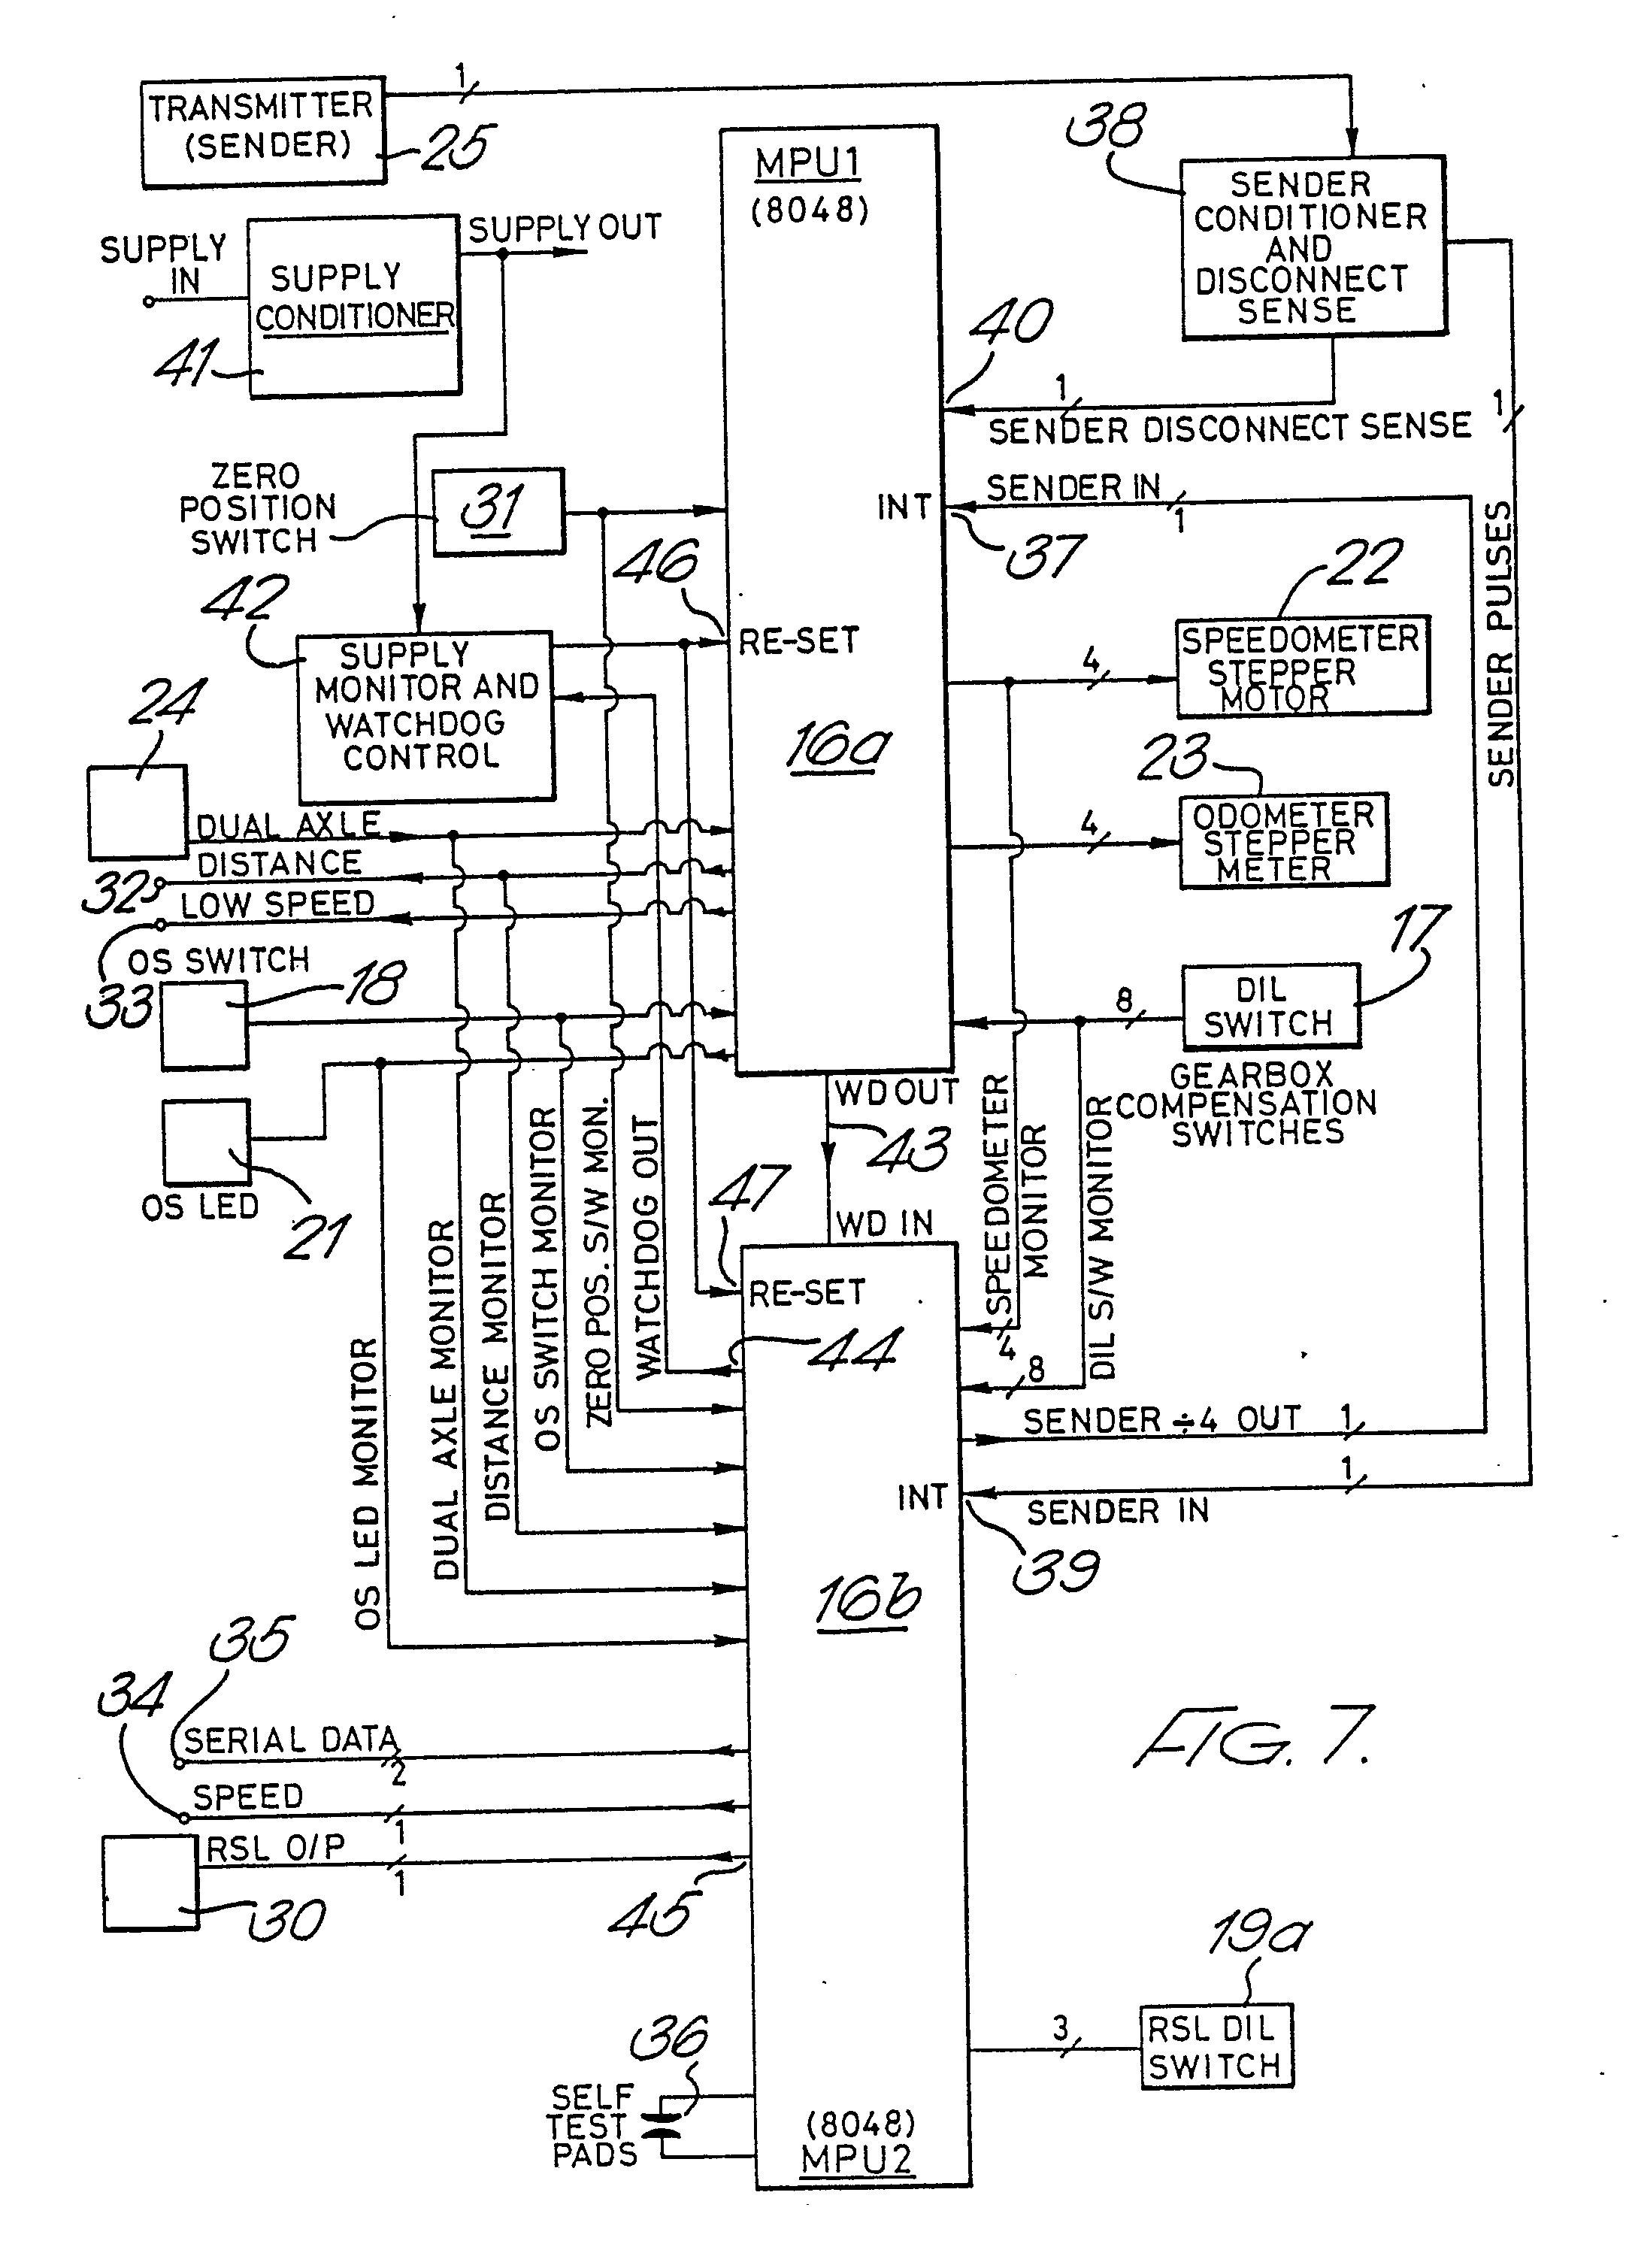 Metra 70 5519 Wiring Diagram Luxury Metra 70 6502 Receiver Wiring Harness Locally 51 Wiring Diagram